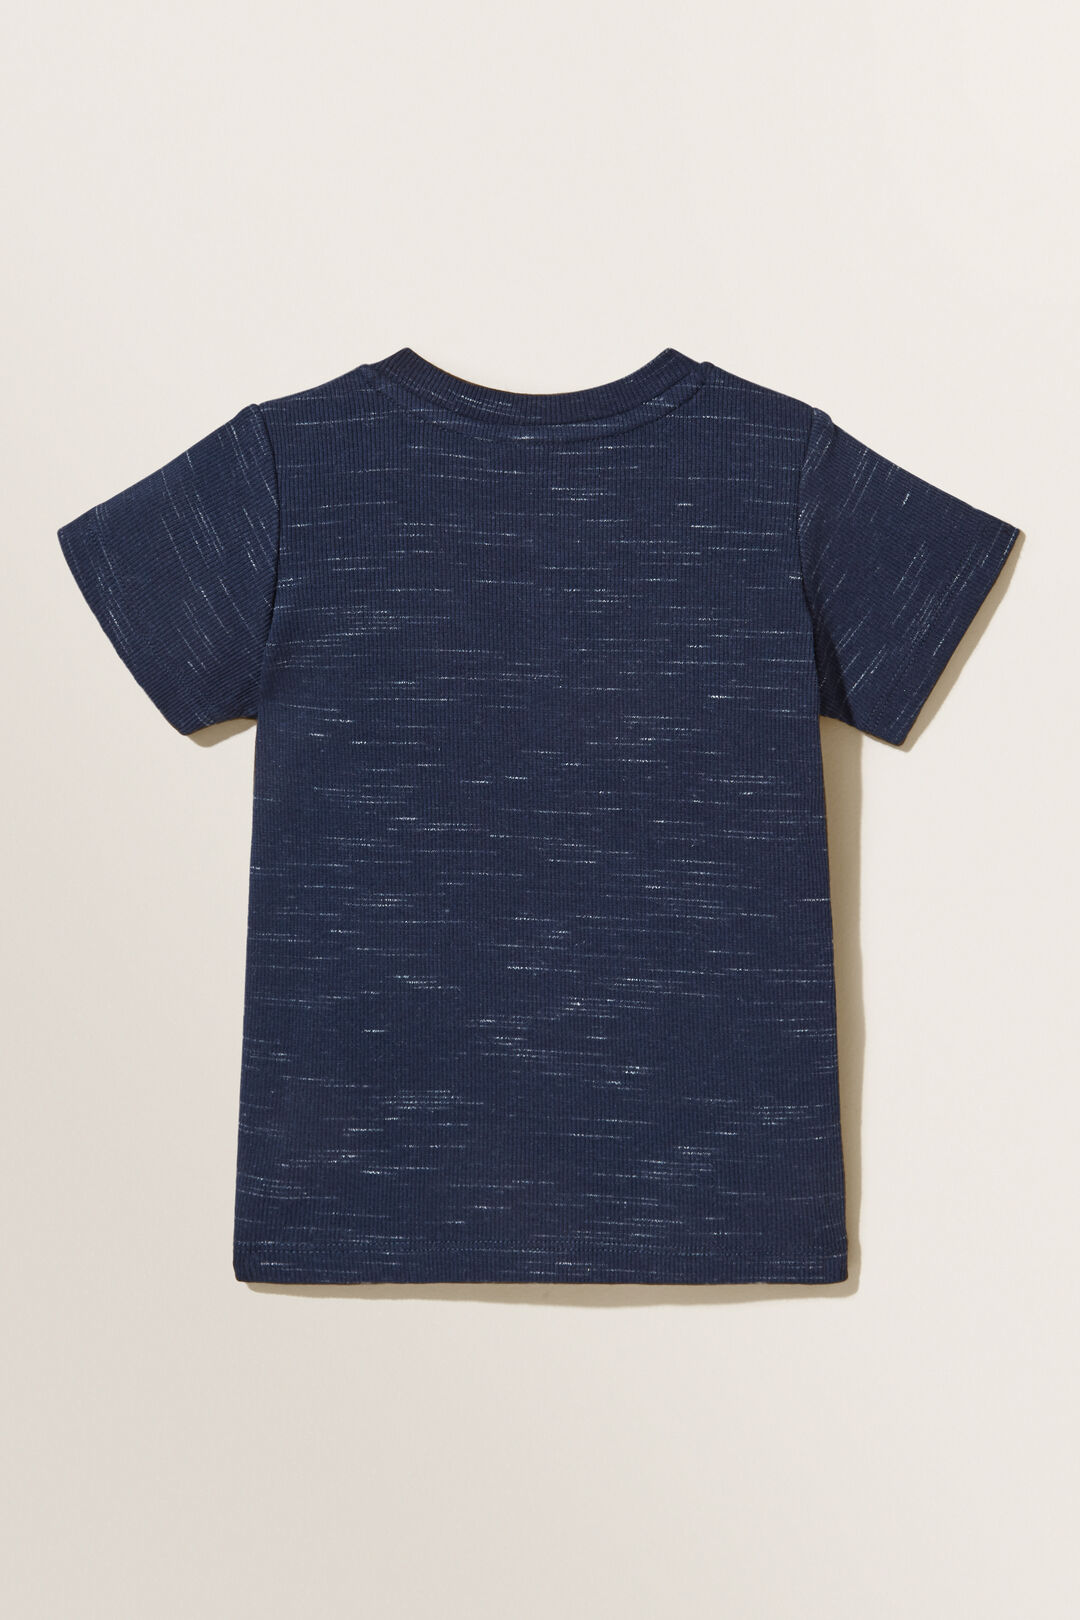 Space Dye Henley Tee  MIDNIGHT BLUE  hi-res